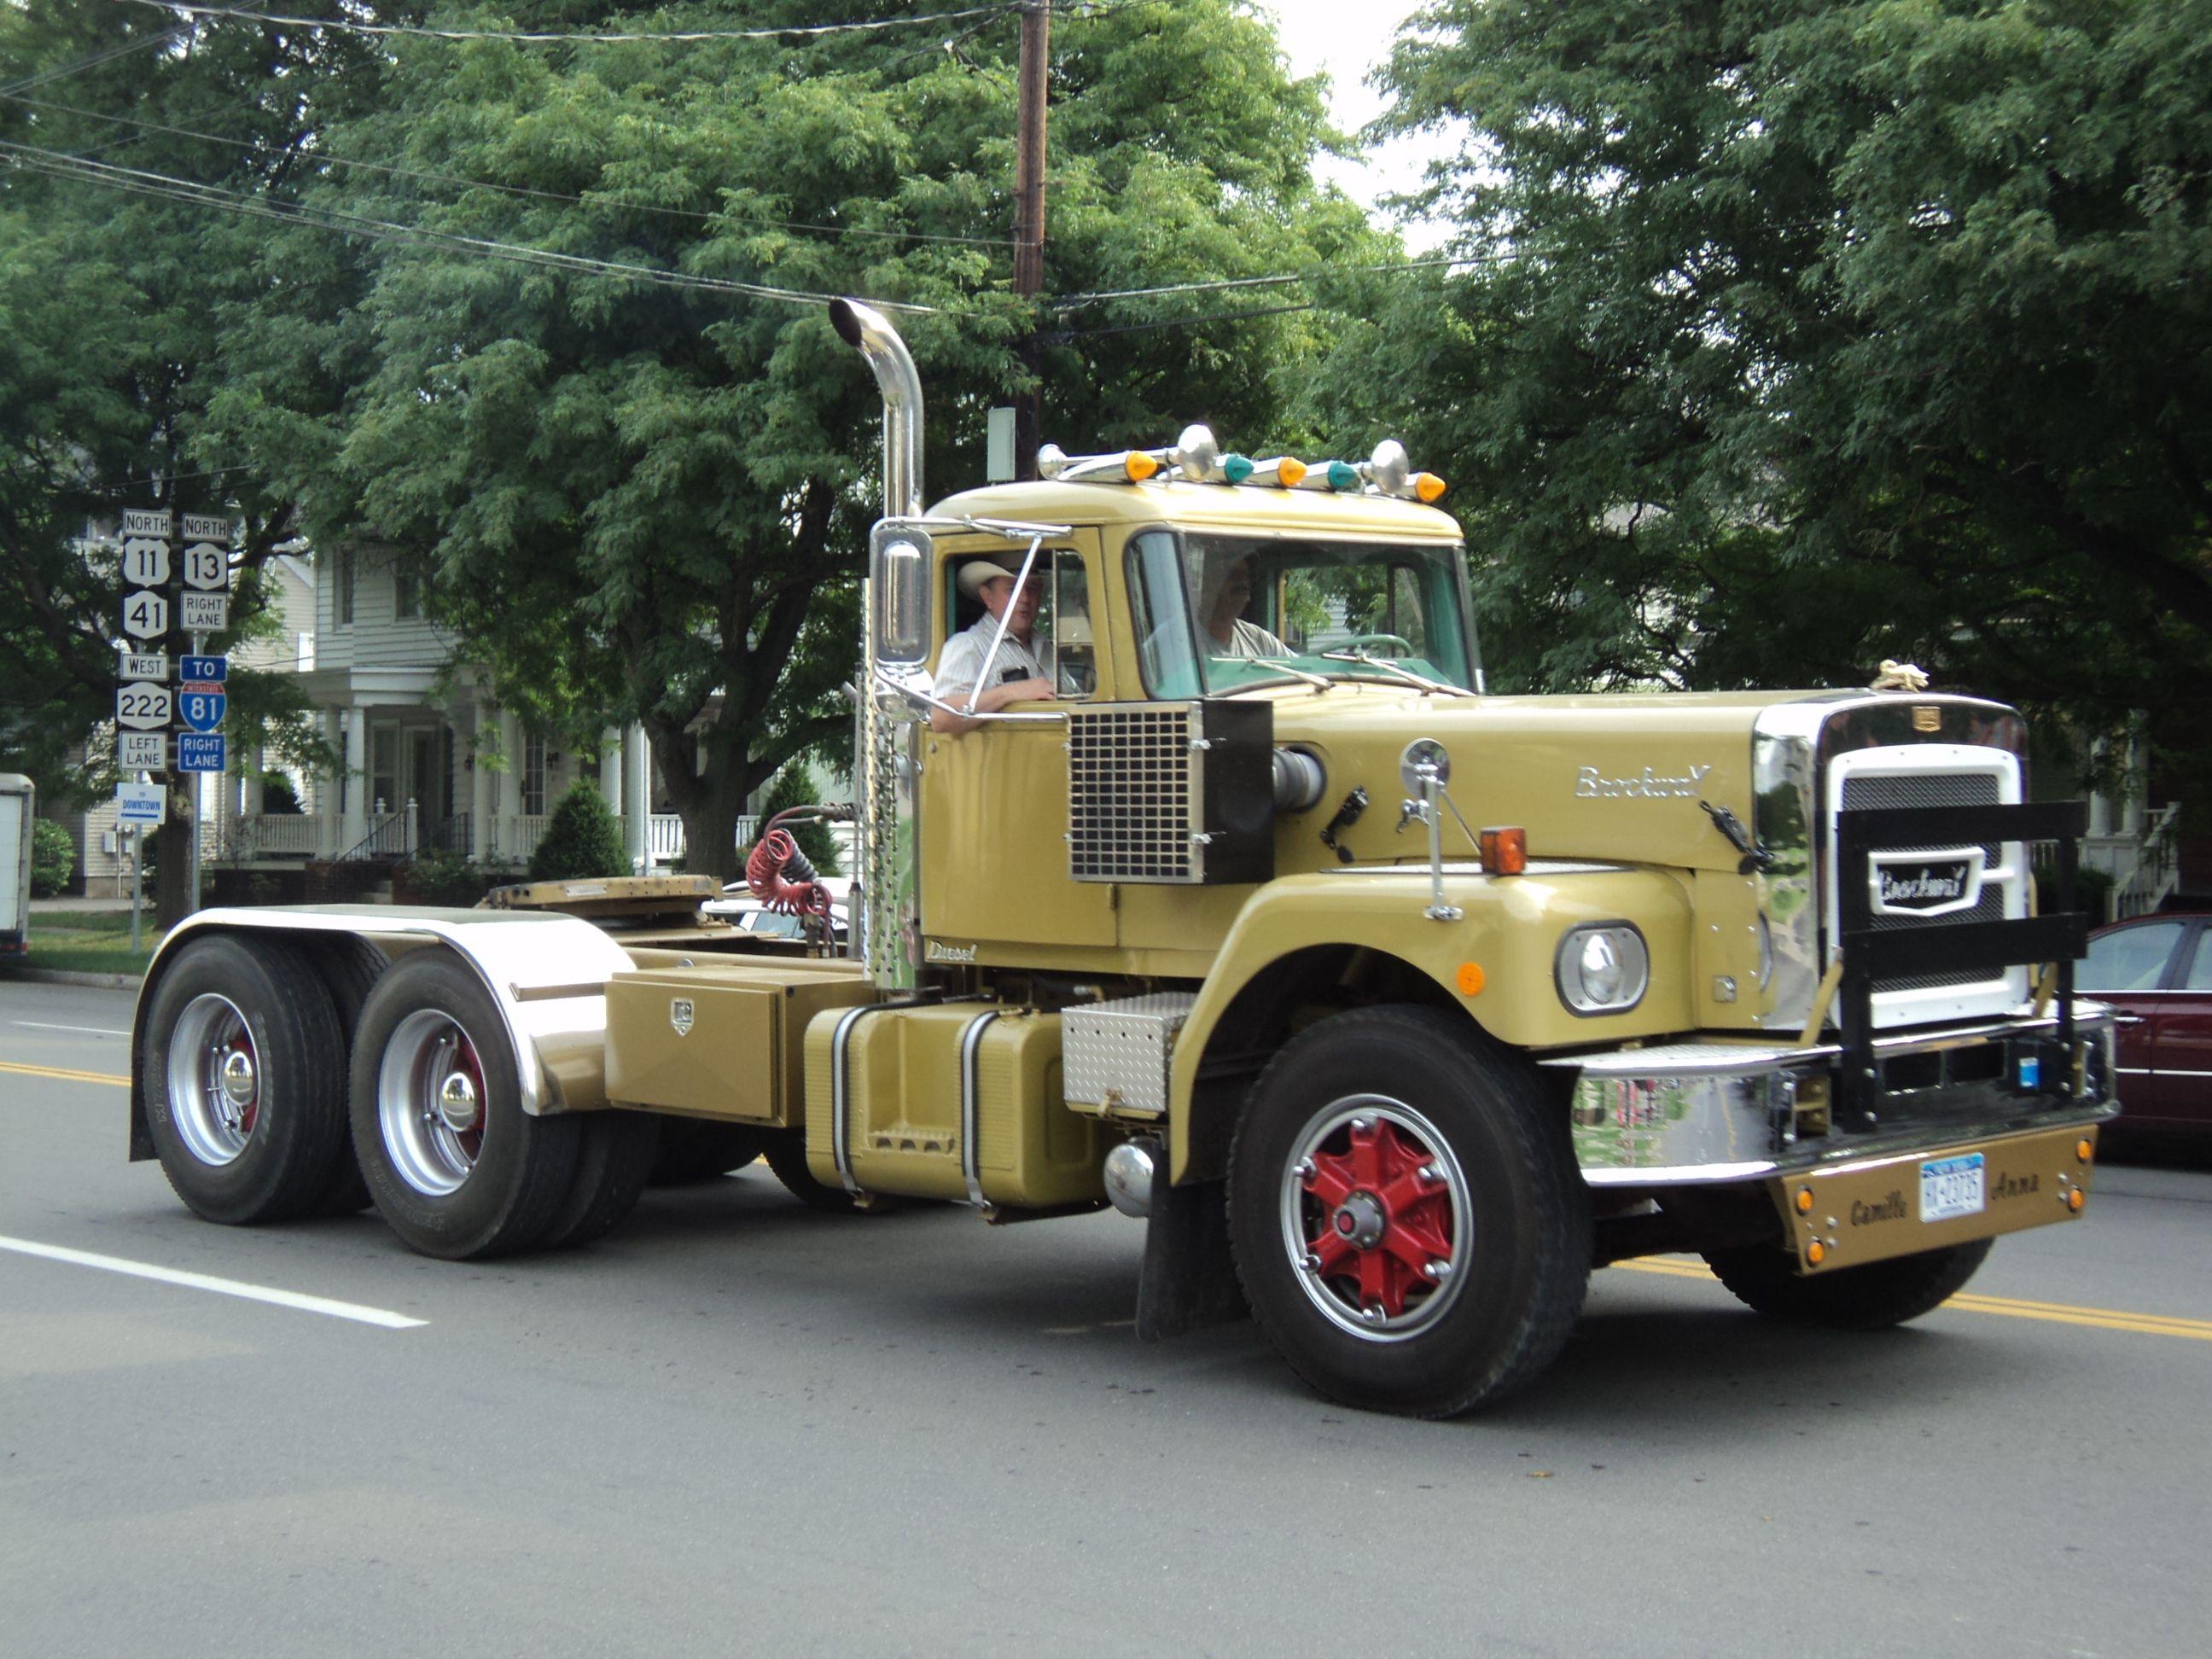 2013 National Brockway Truck Show Cortland Ny Picture By Jeremy George Trucks Big Rig Trucks Big Trucks